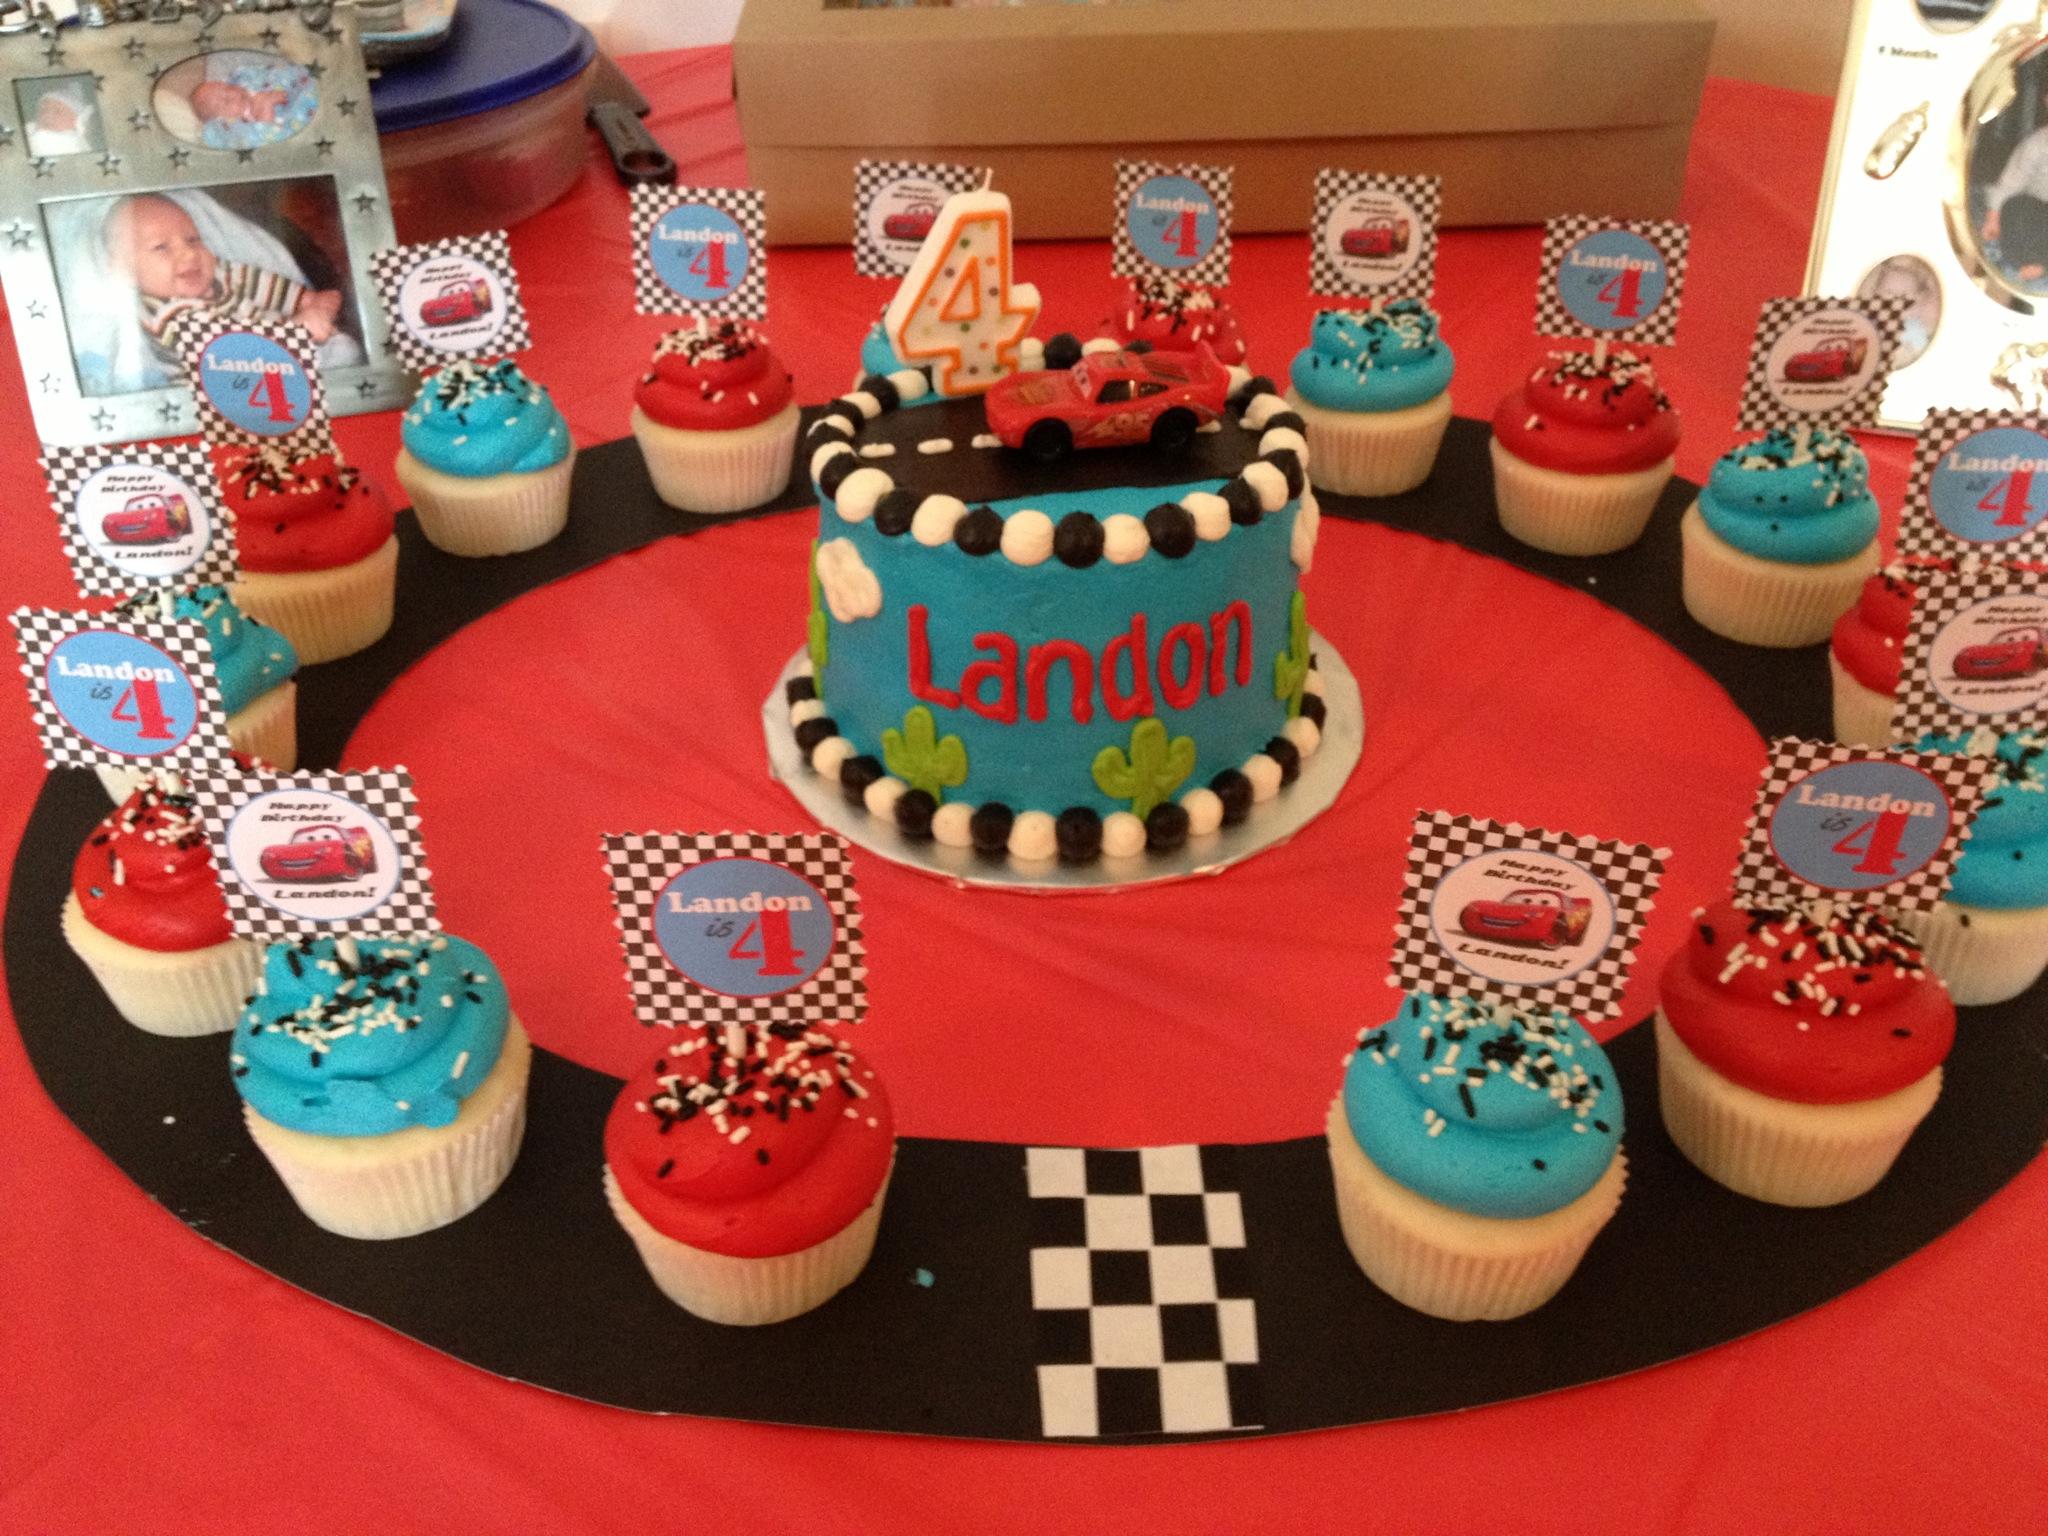 Marvelous 11 Disney Cars Birthday Cake With Cupcakes Photo Race Car Birthday Cards Printable Inklcafe Filternl